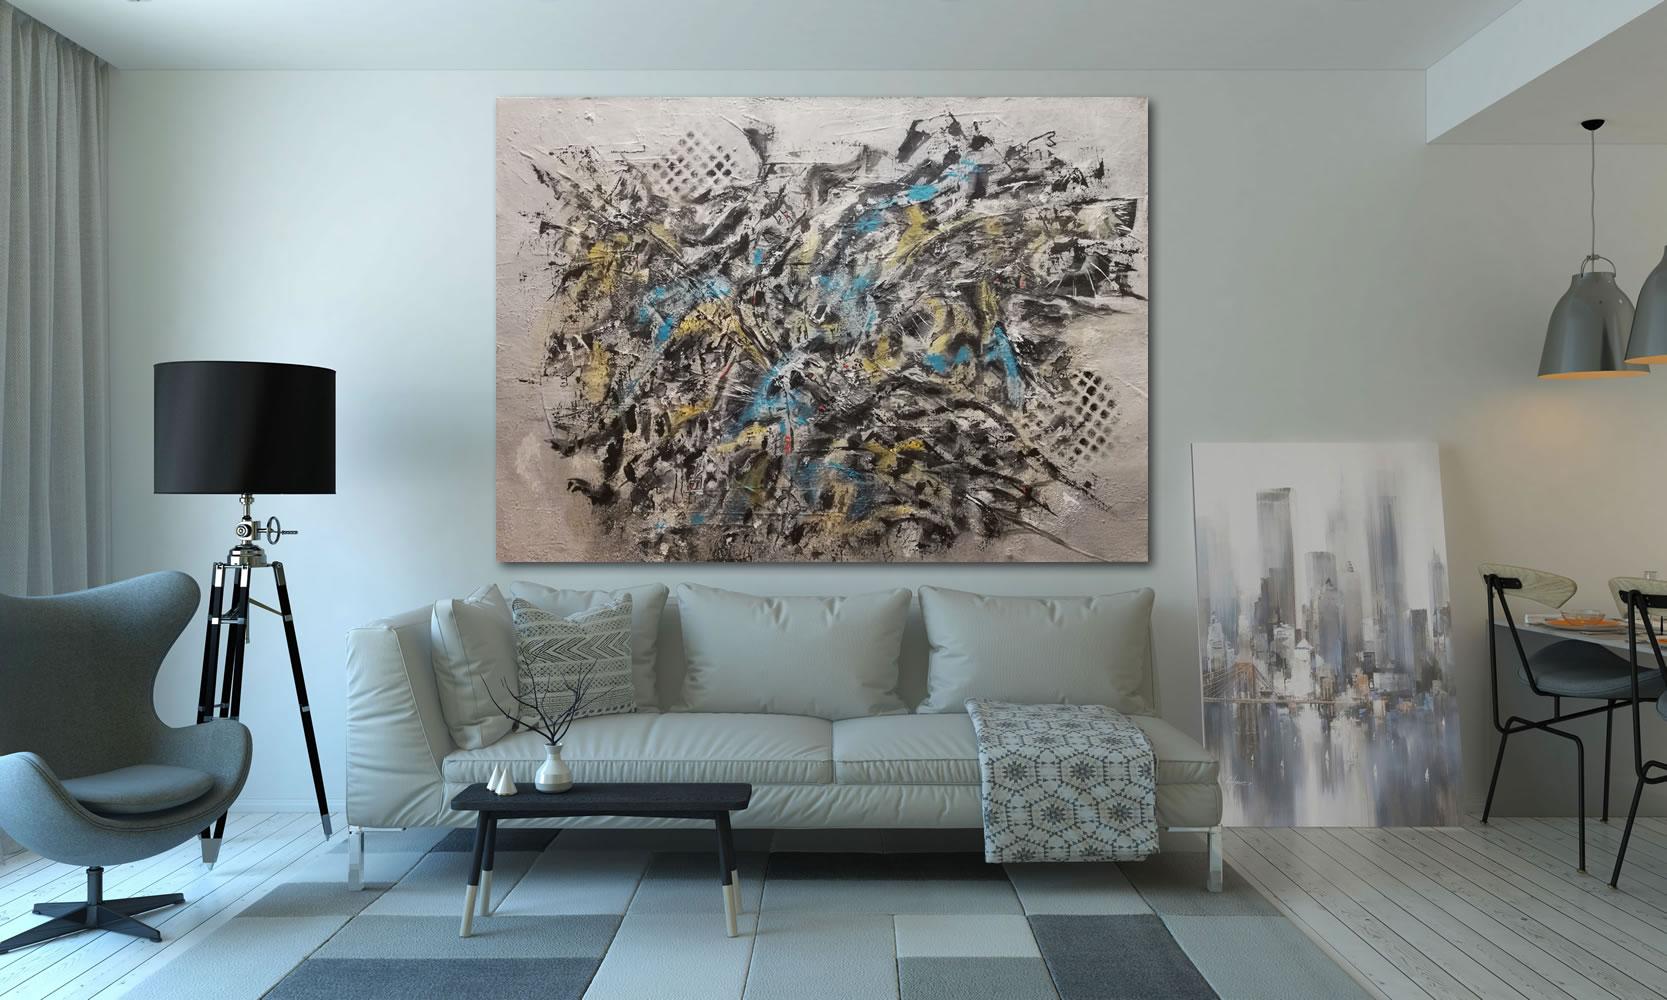 Acryl on canvas / Acrilico sobre tela (50cm x 70cm)